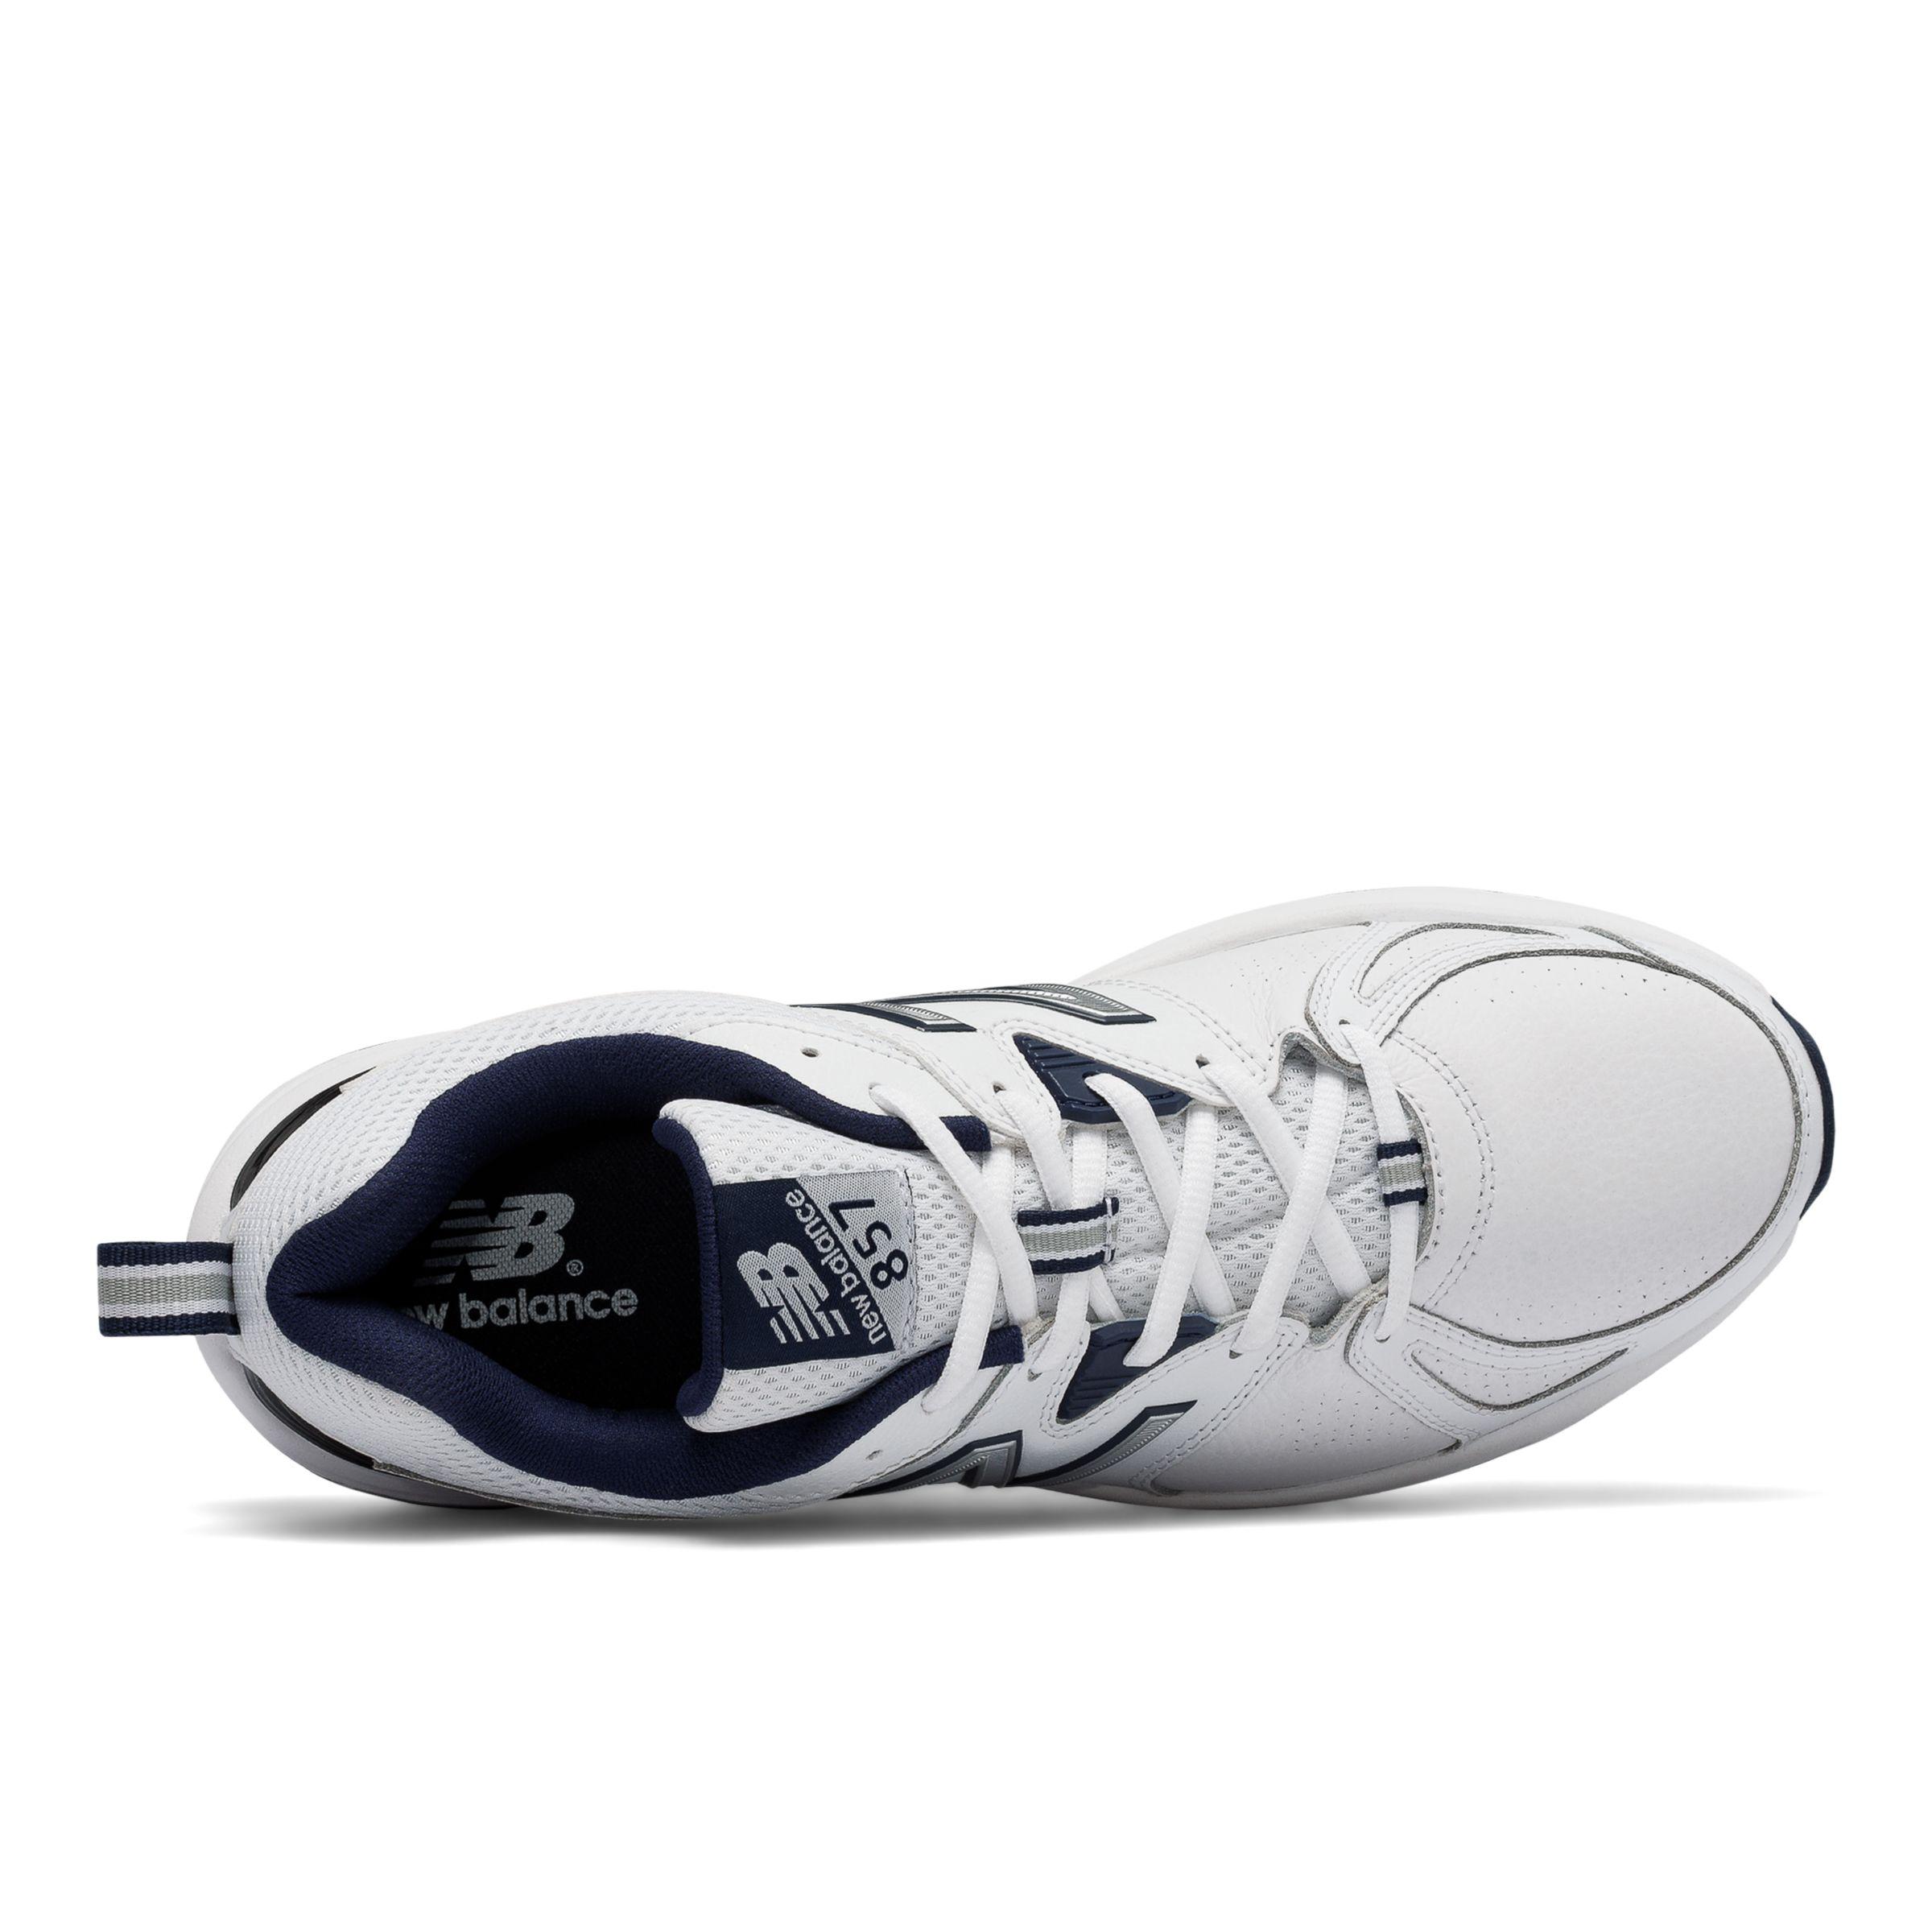 thumbnail 11 - New-Balance-857v2-Men-039-s-Running-Training-Shoes